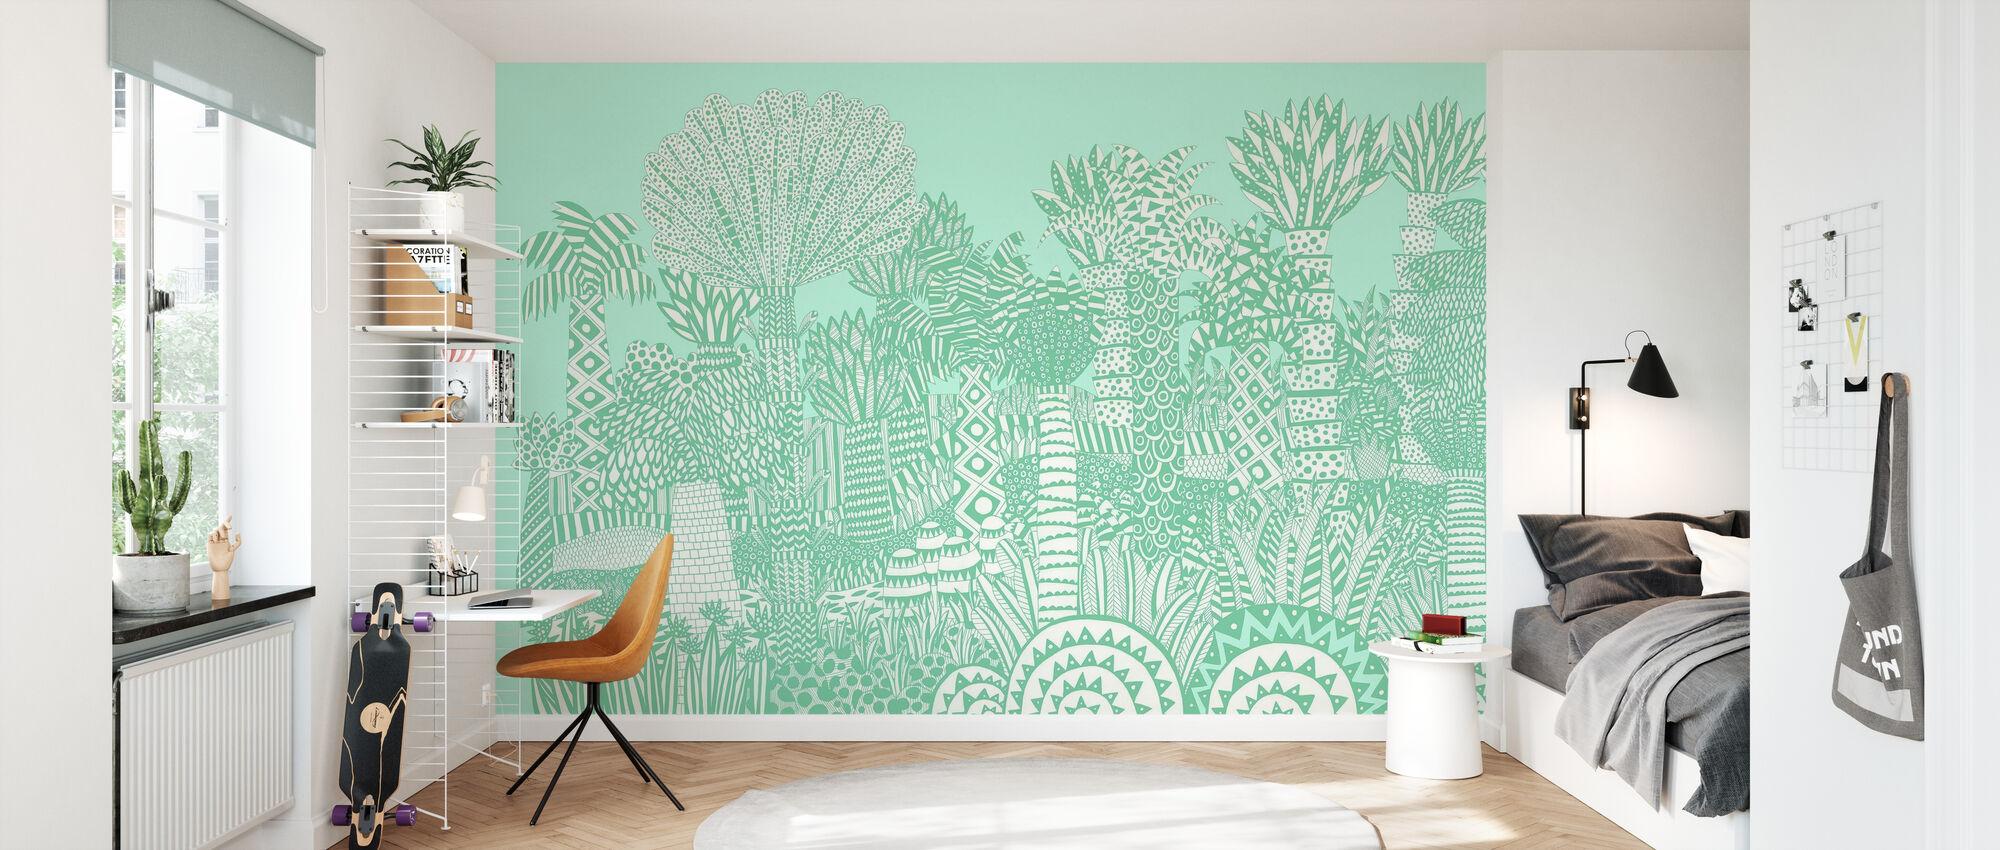 Jungle Groen - Behang - Kinderkamer